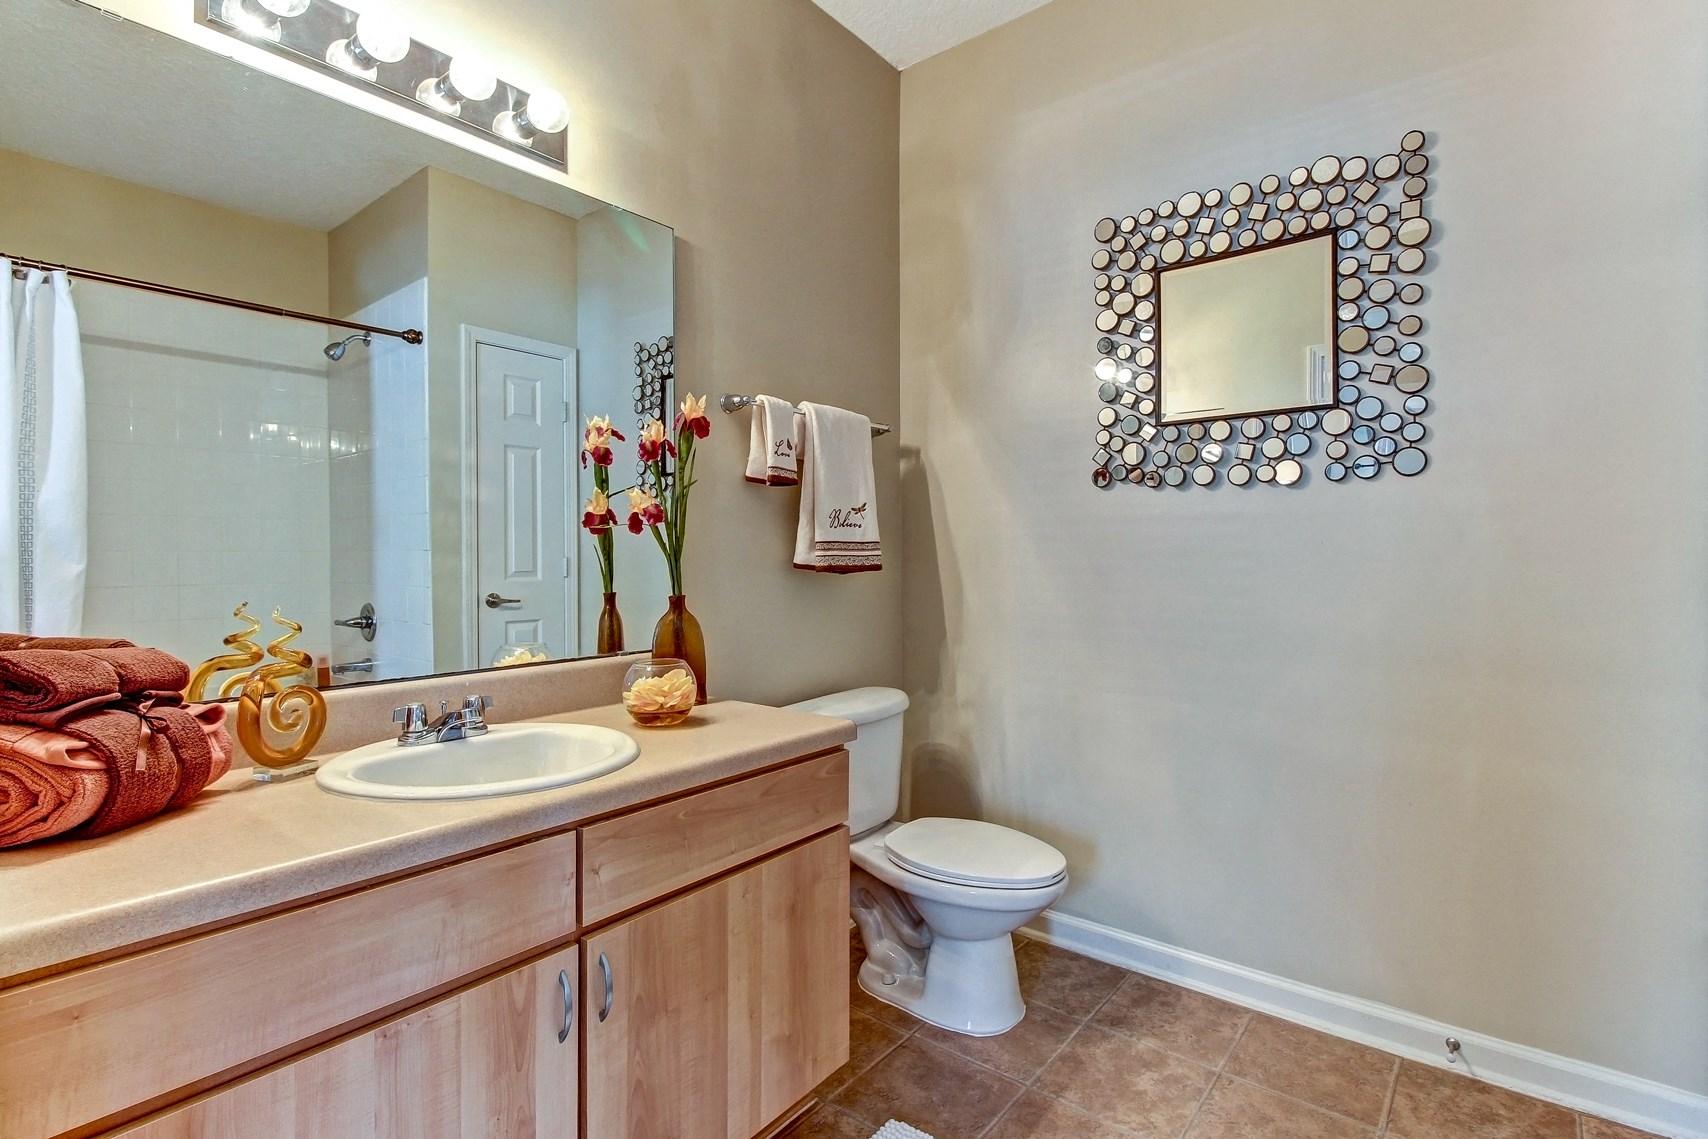 Bathroom at Magnolia Village Apartments in Jacksonville, FL